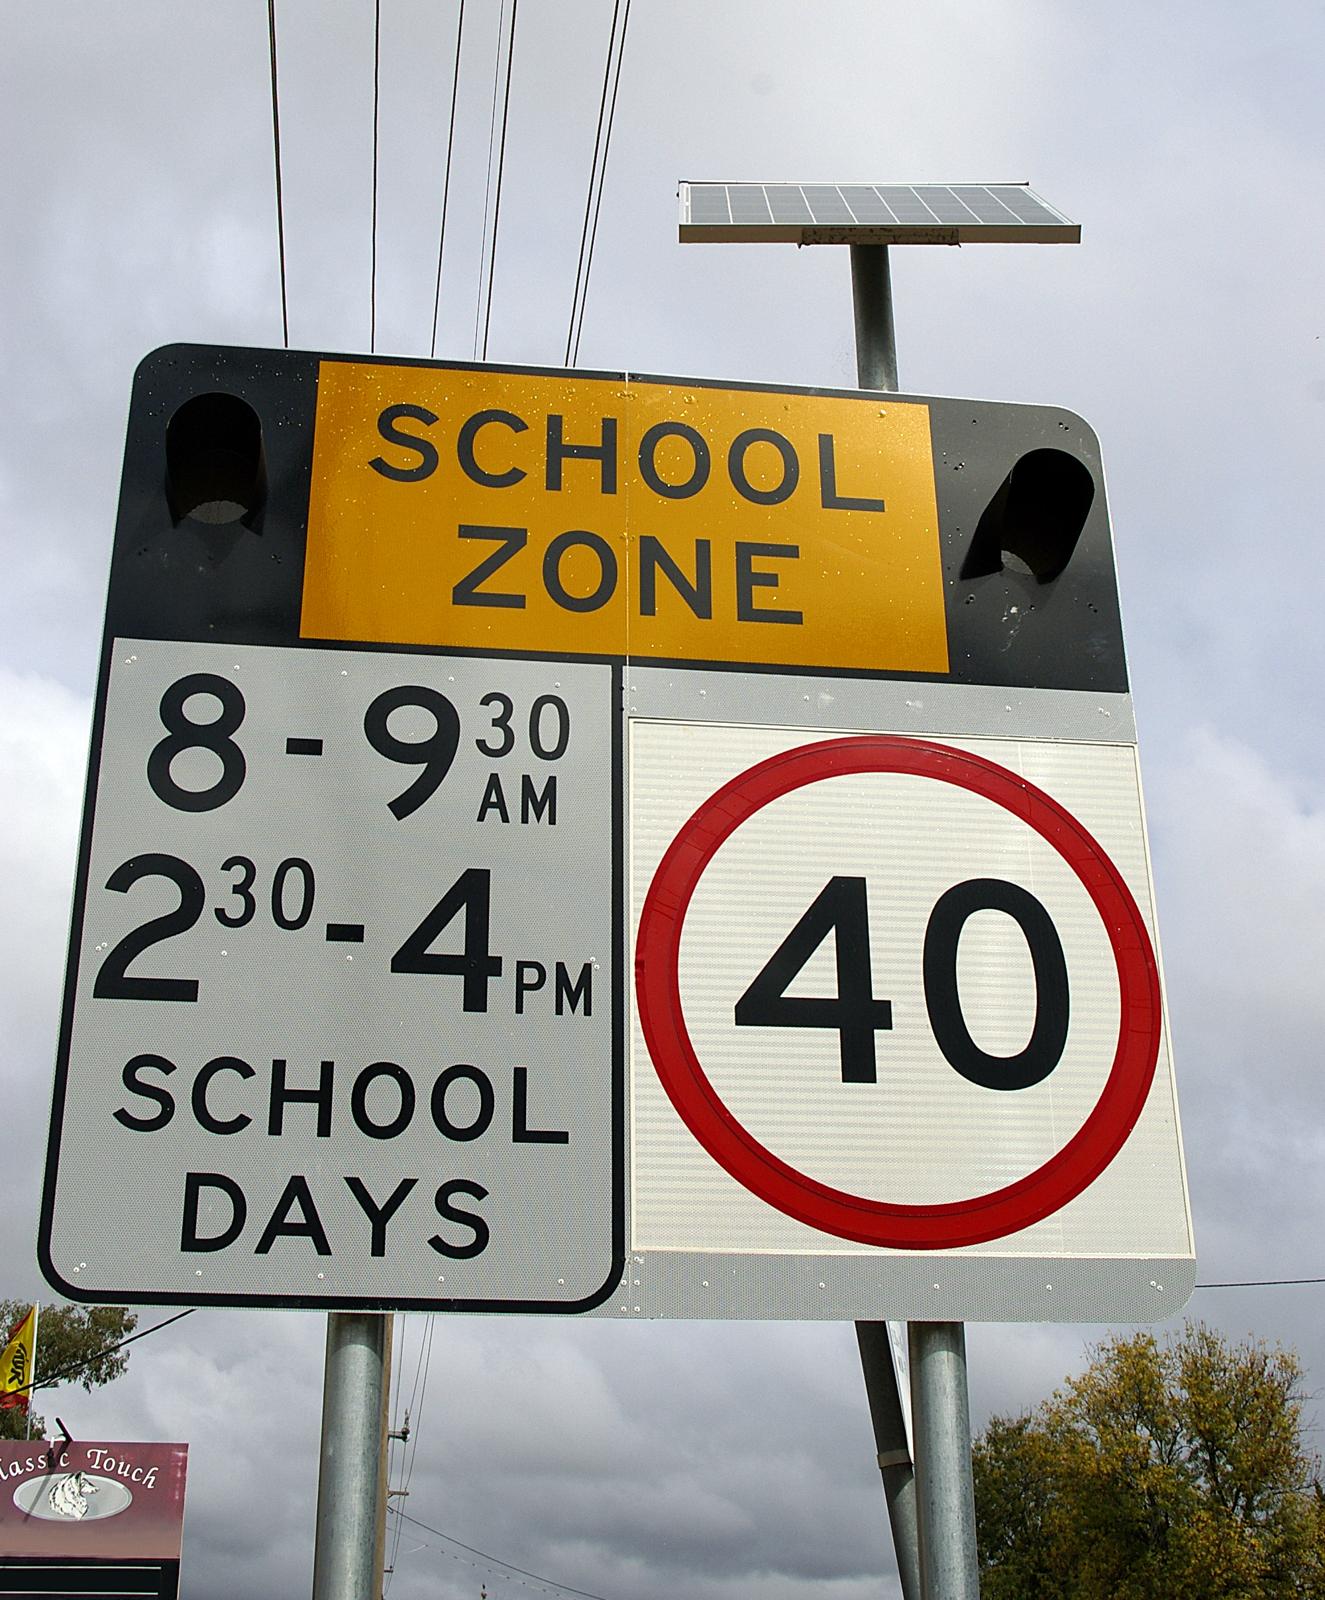 https://upload.wikimedia.org/wikipedia/commons/d/d7/School_zone_flashing_light_warning_sign.jpg